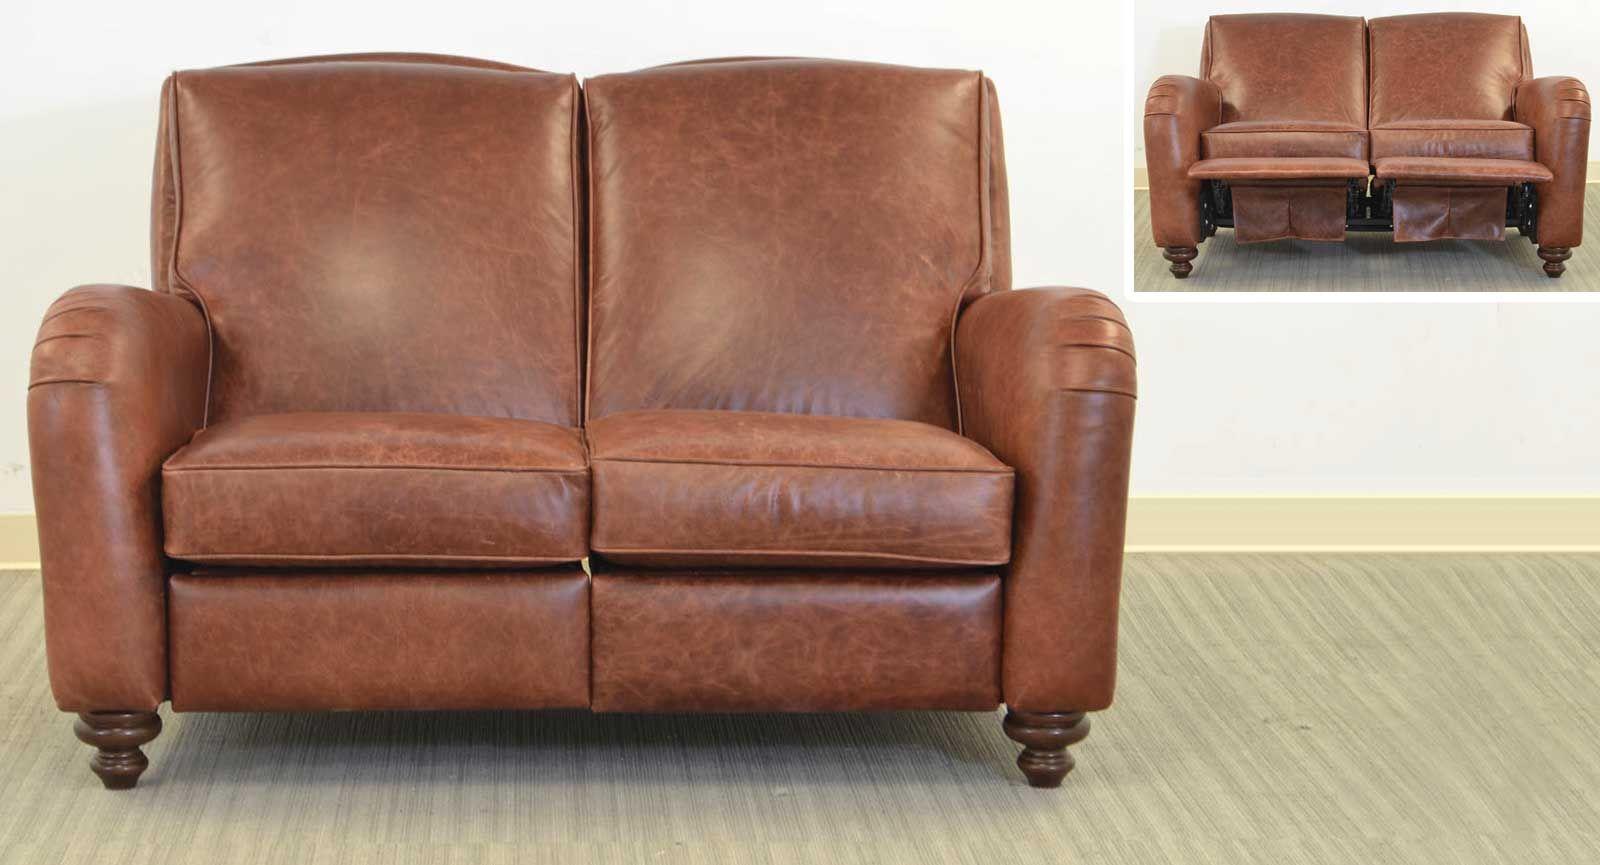 Jordi Reclining Loveseat ‹‹ The Leather Sofa Company Medium ...